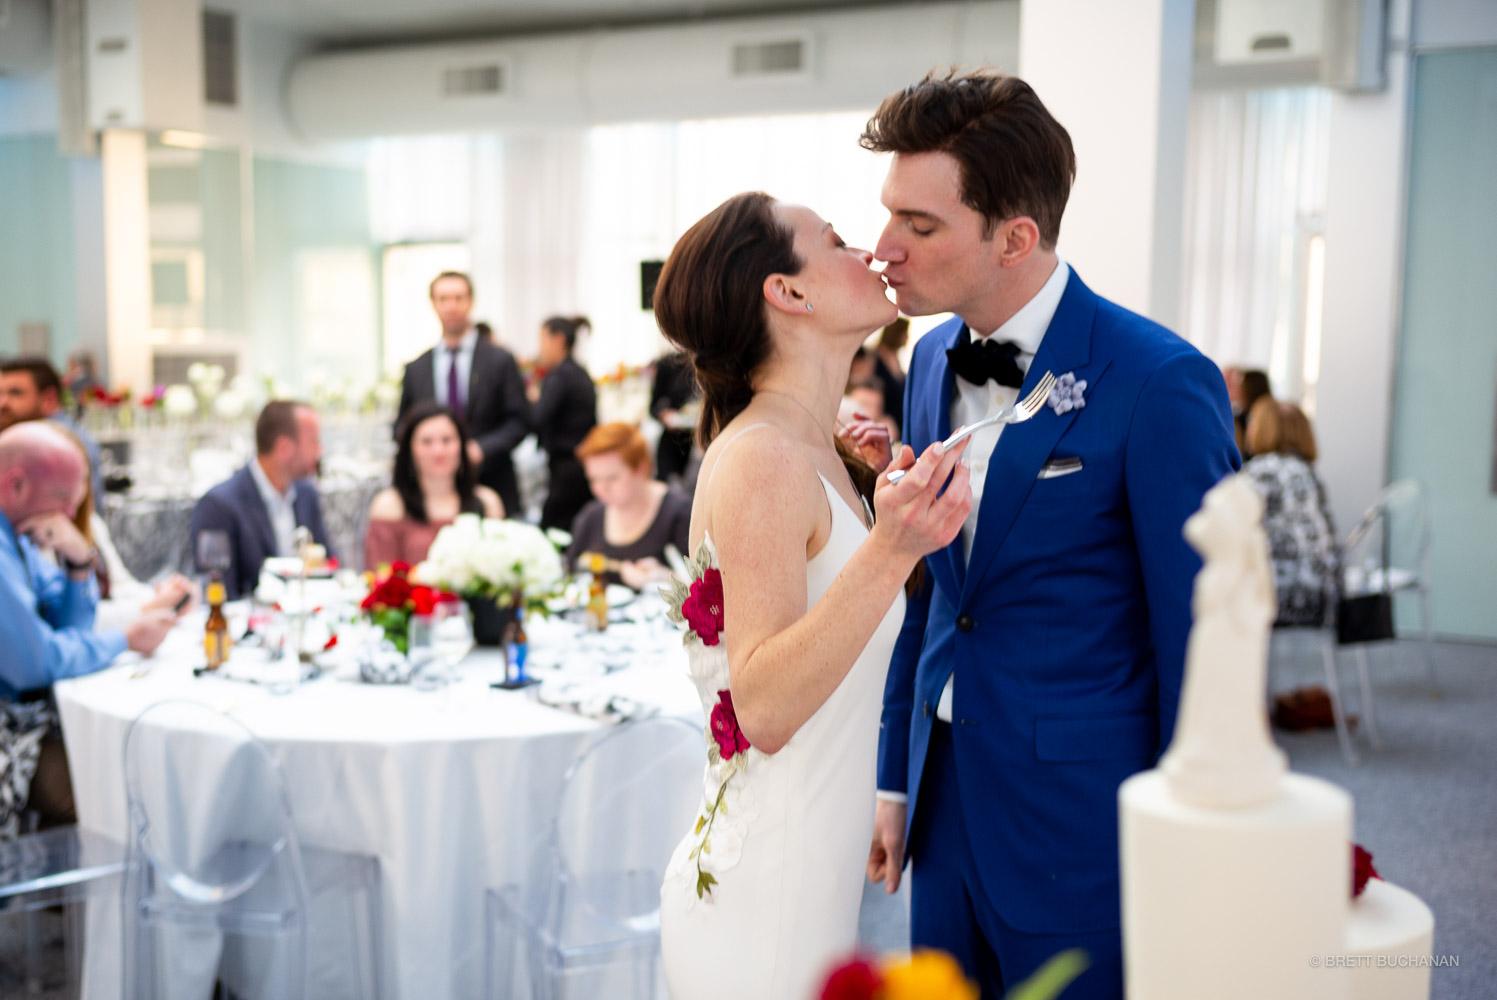 Austin-wedding-photographer-dallas-eyeball-joule-54